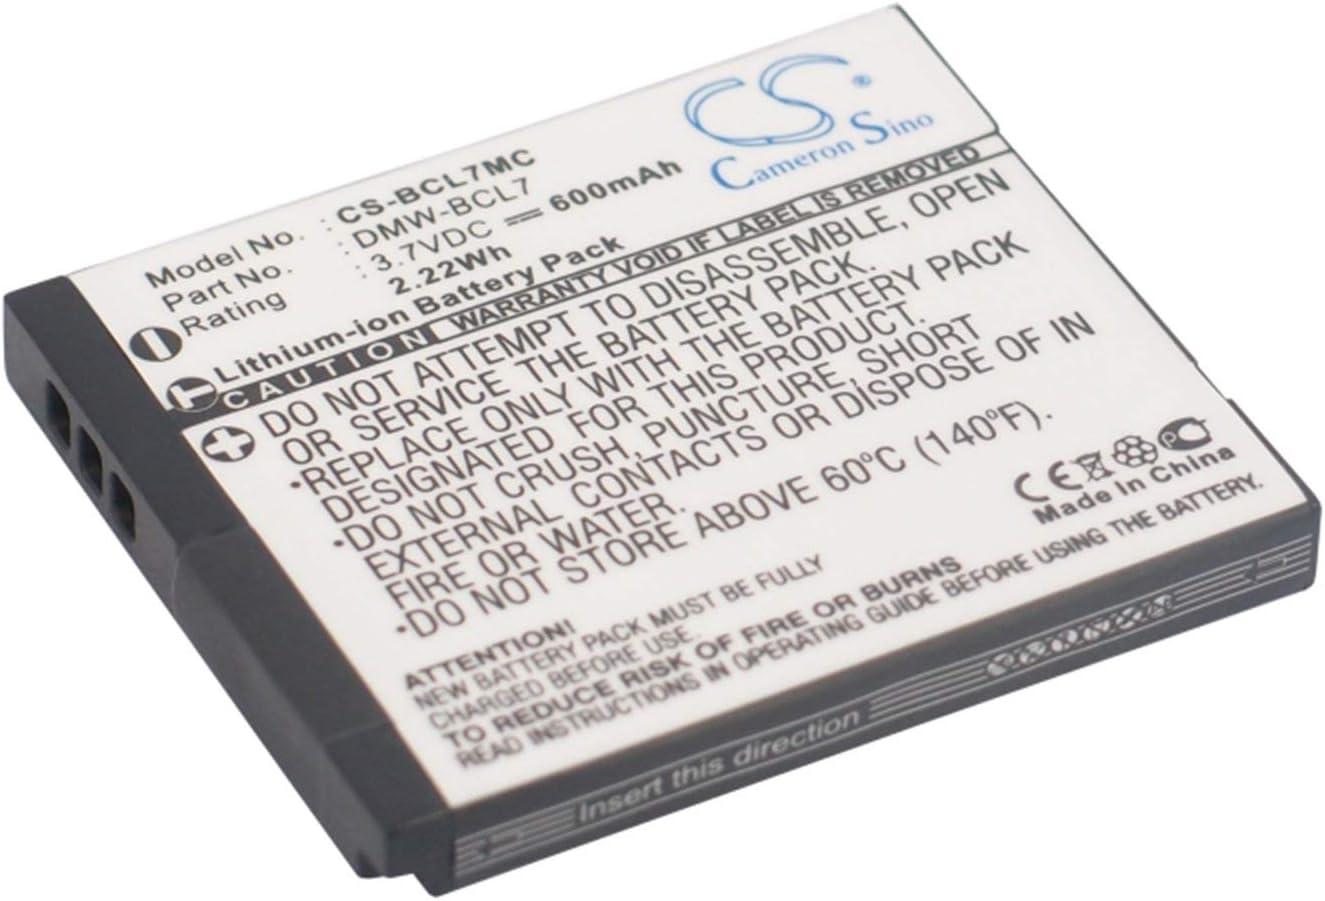 BATTERIA 600mAh 3.7V per Panasonic Lumix DMC-SZ3 DMC-SZ3V DMC-SZ9 DMC-XS1